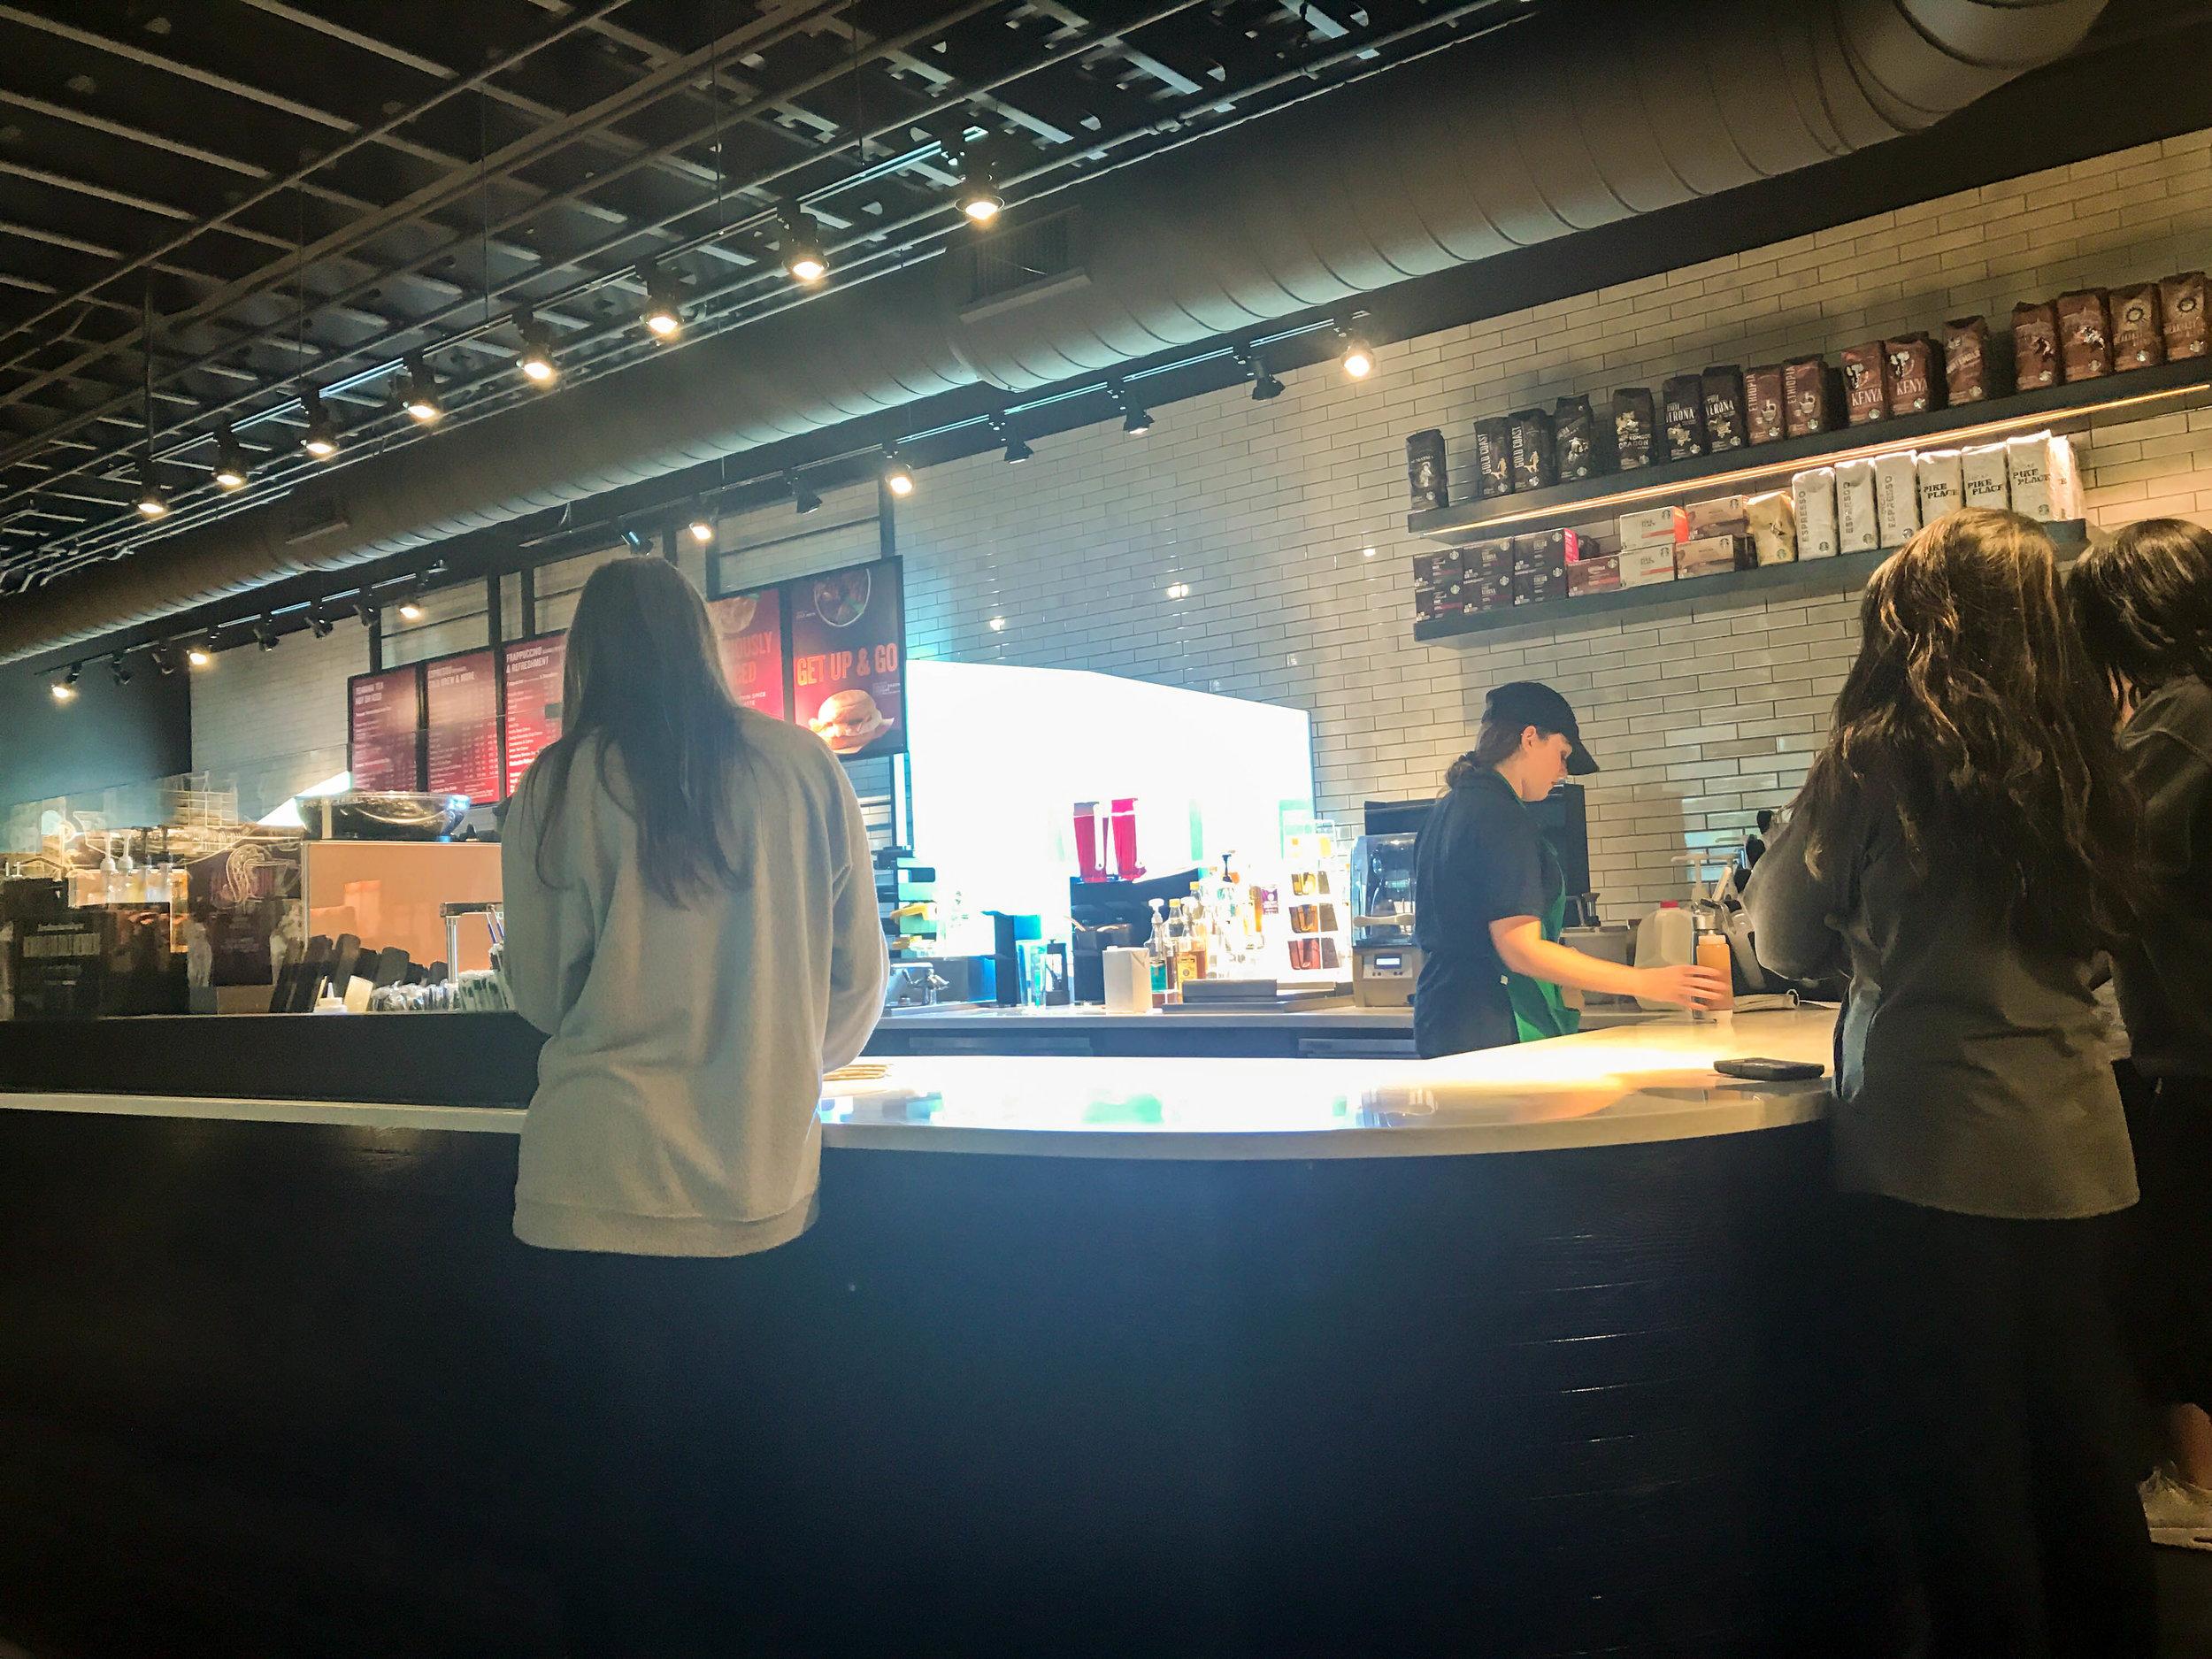 A first look inside Quinnipiac's new Starbucks                                                                                                 Photo by Dorah Labatte